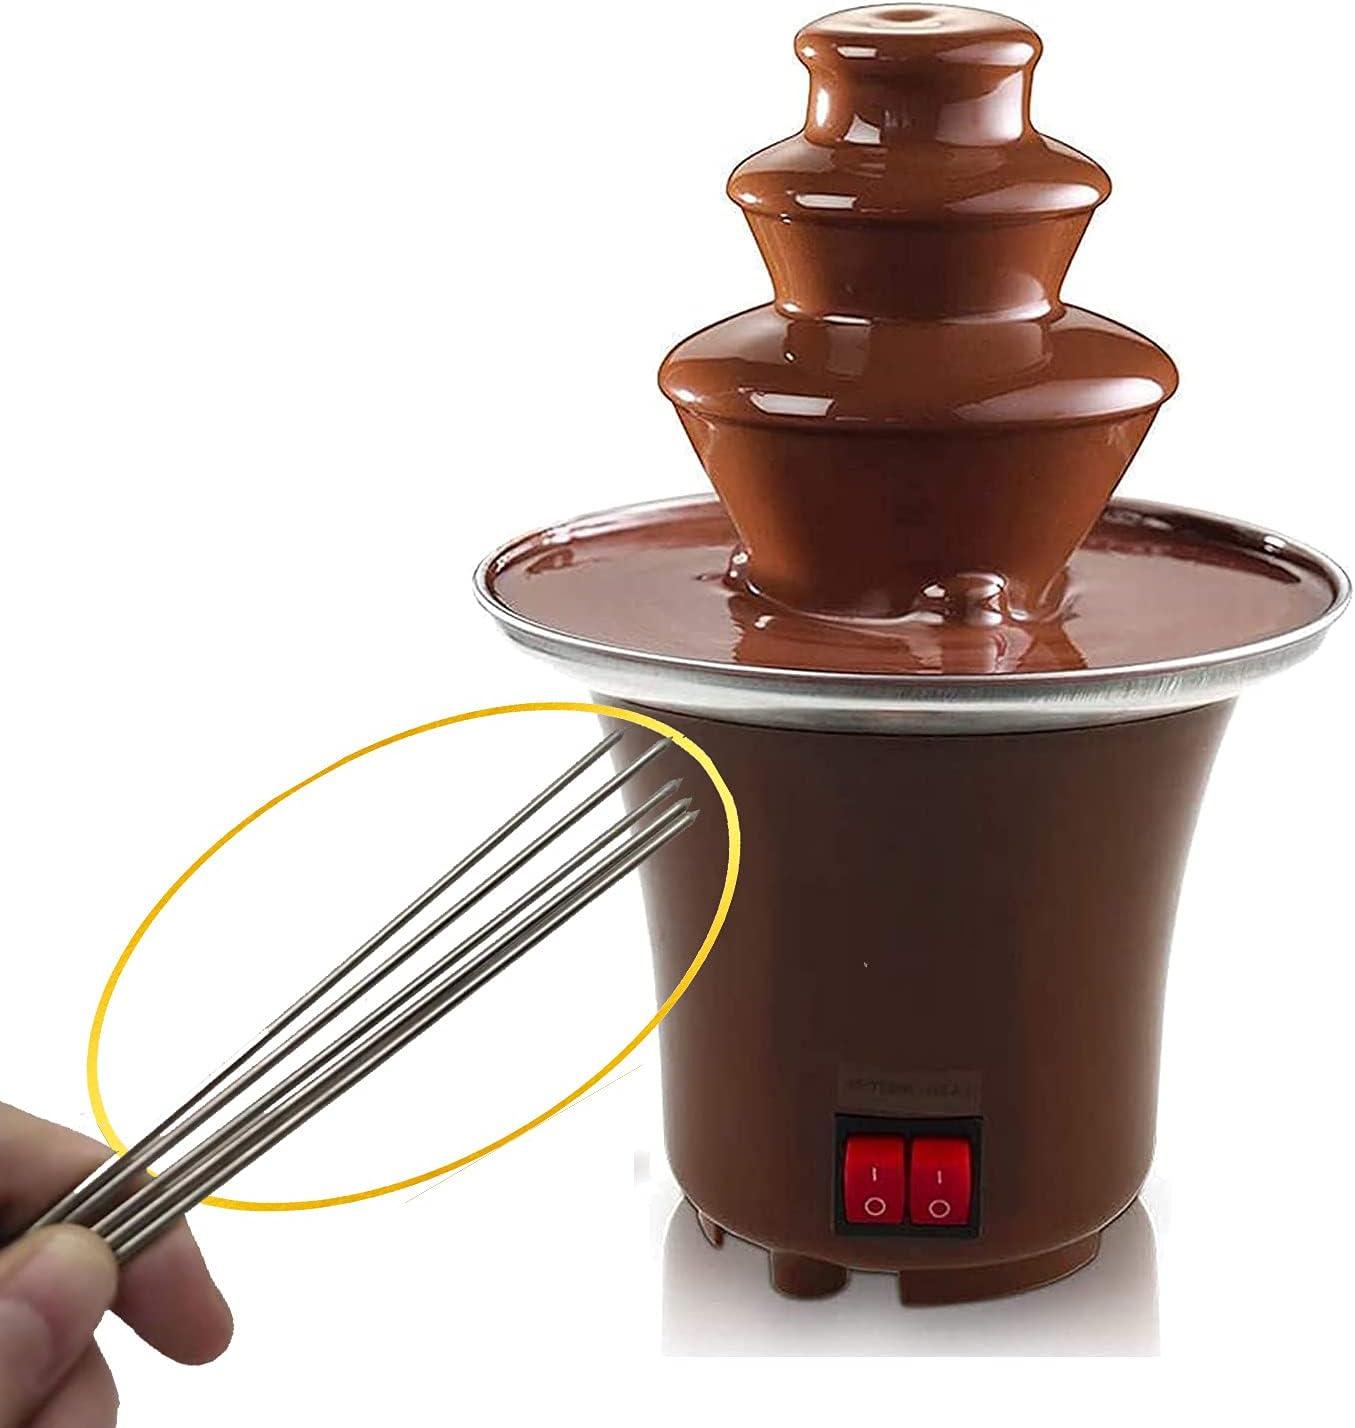 SK CASA Chocolate Fondue Fountain - Luxury Mac 3 Electric Tiers Max 73% OFF Melting